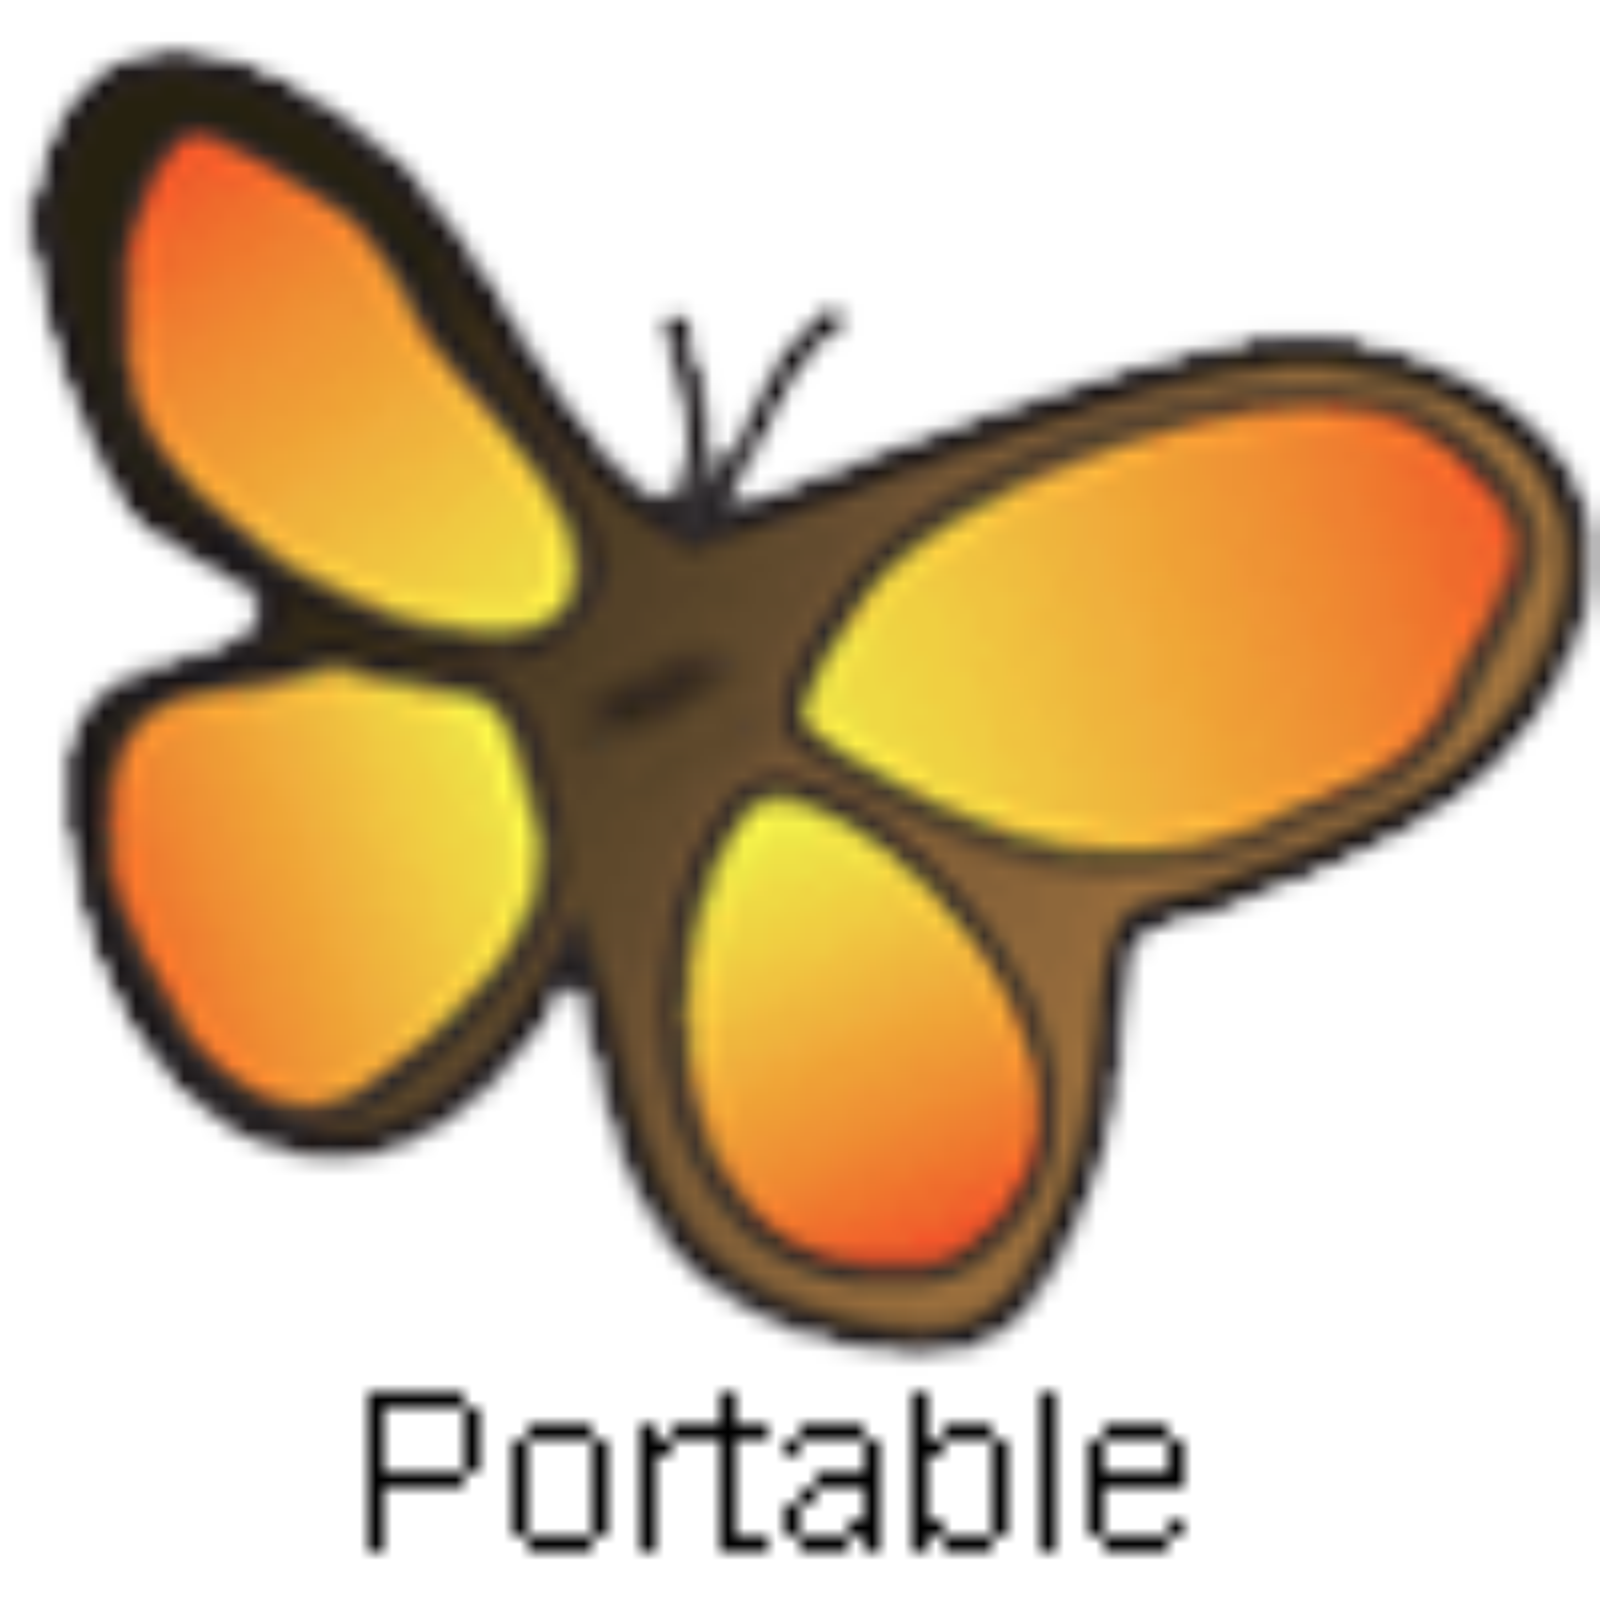 FreeMind Portable